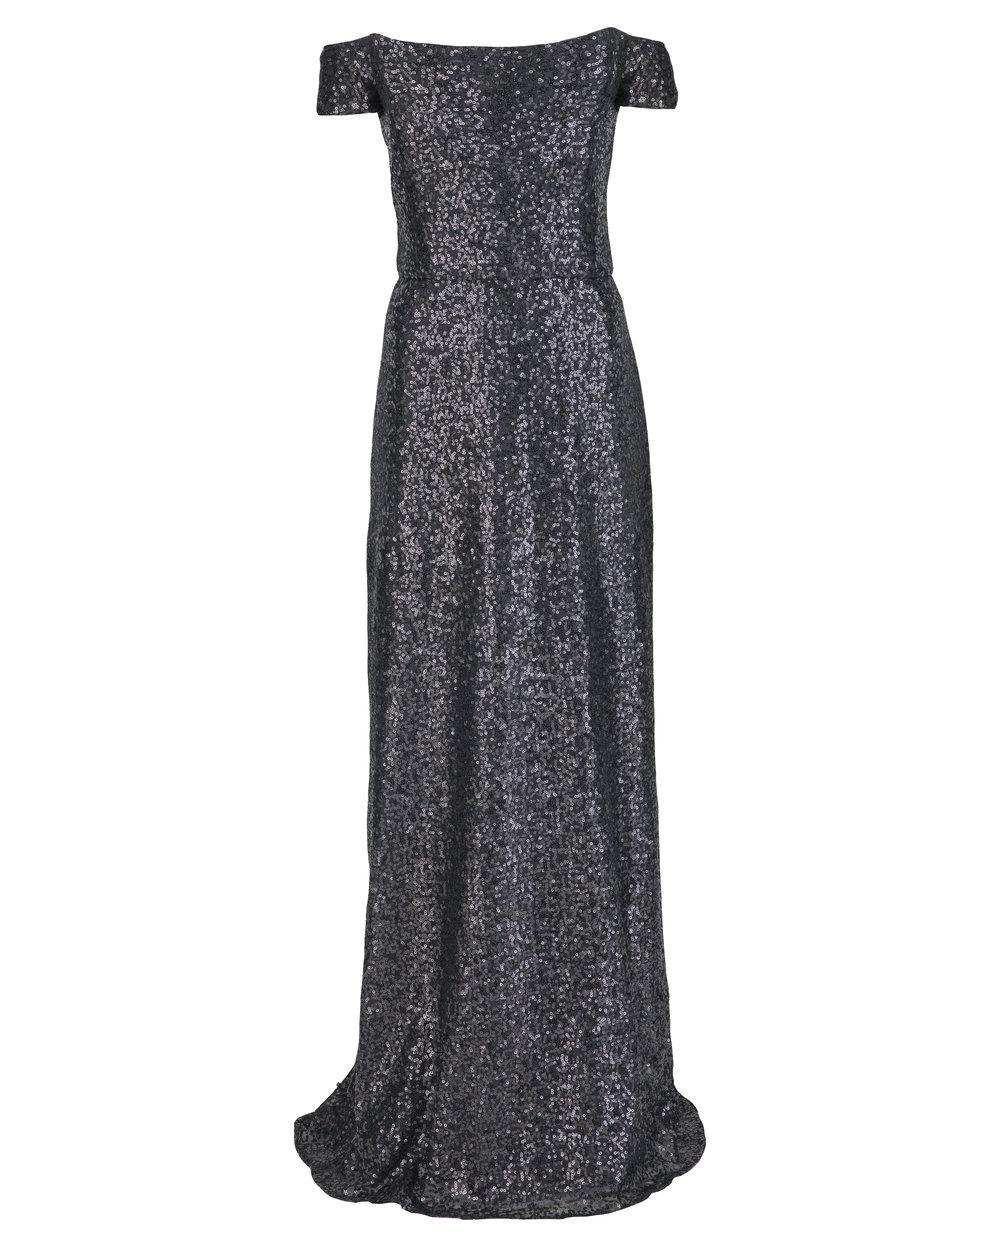 Amsale Sian GB036Q Black Sequin